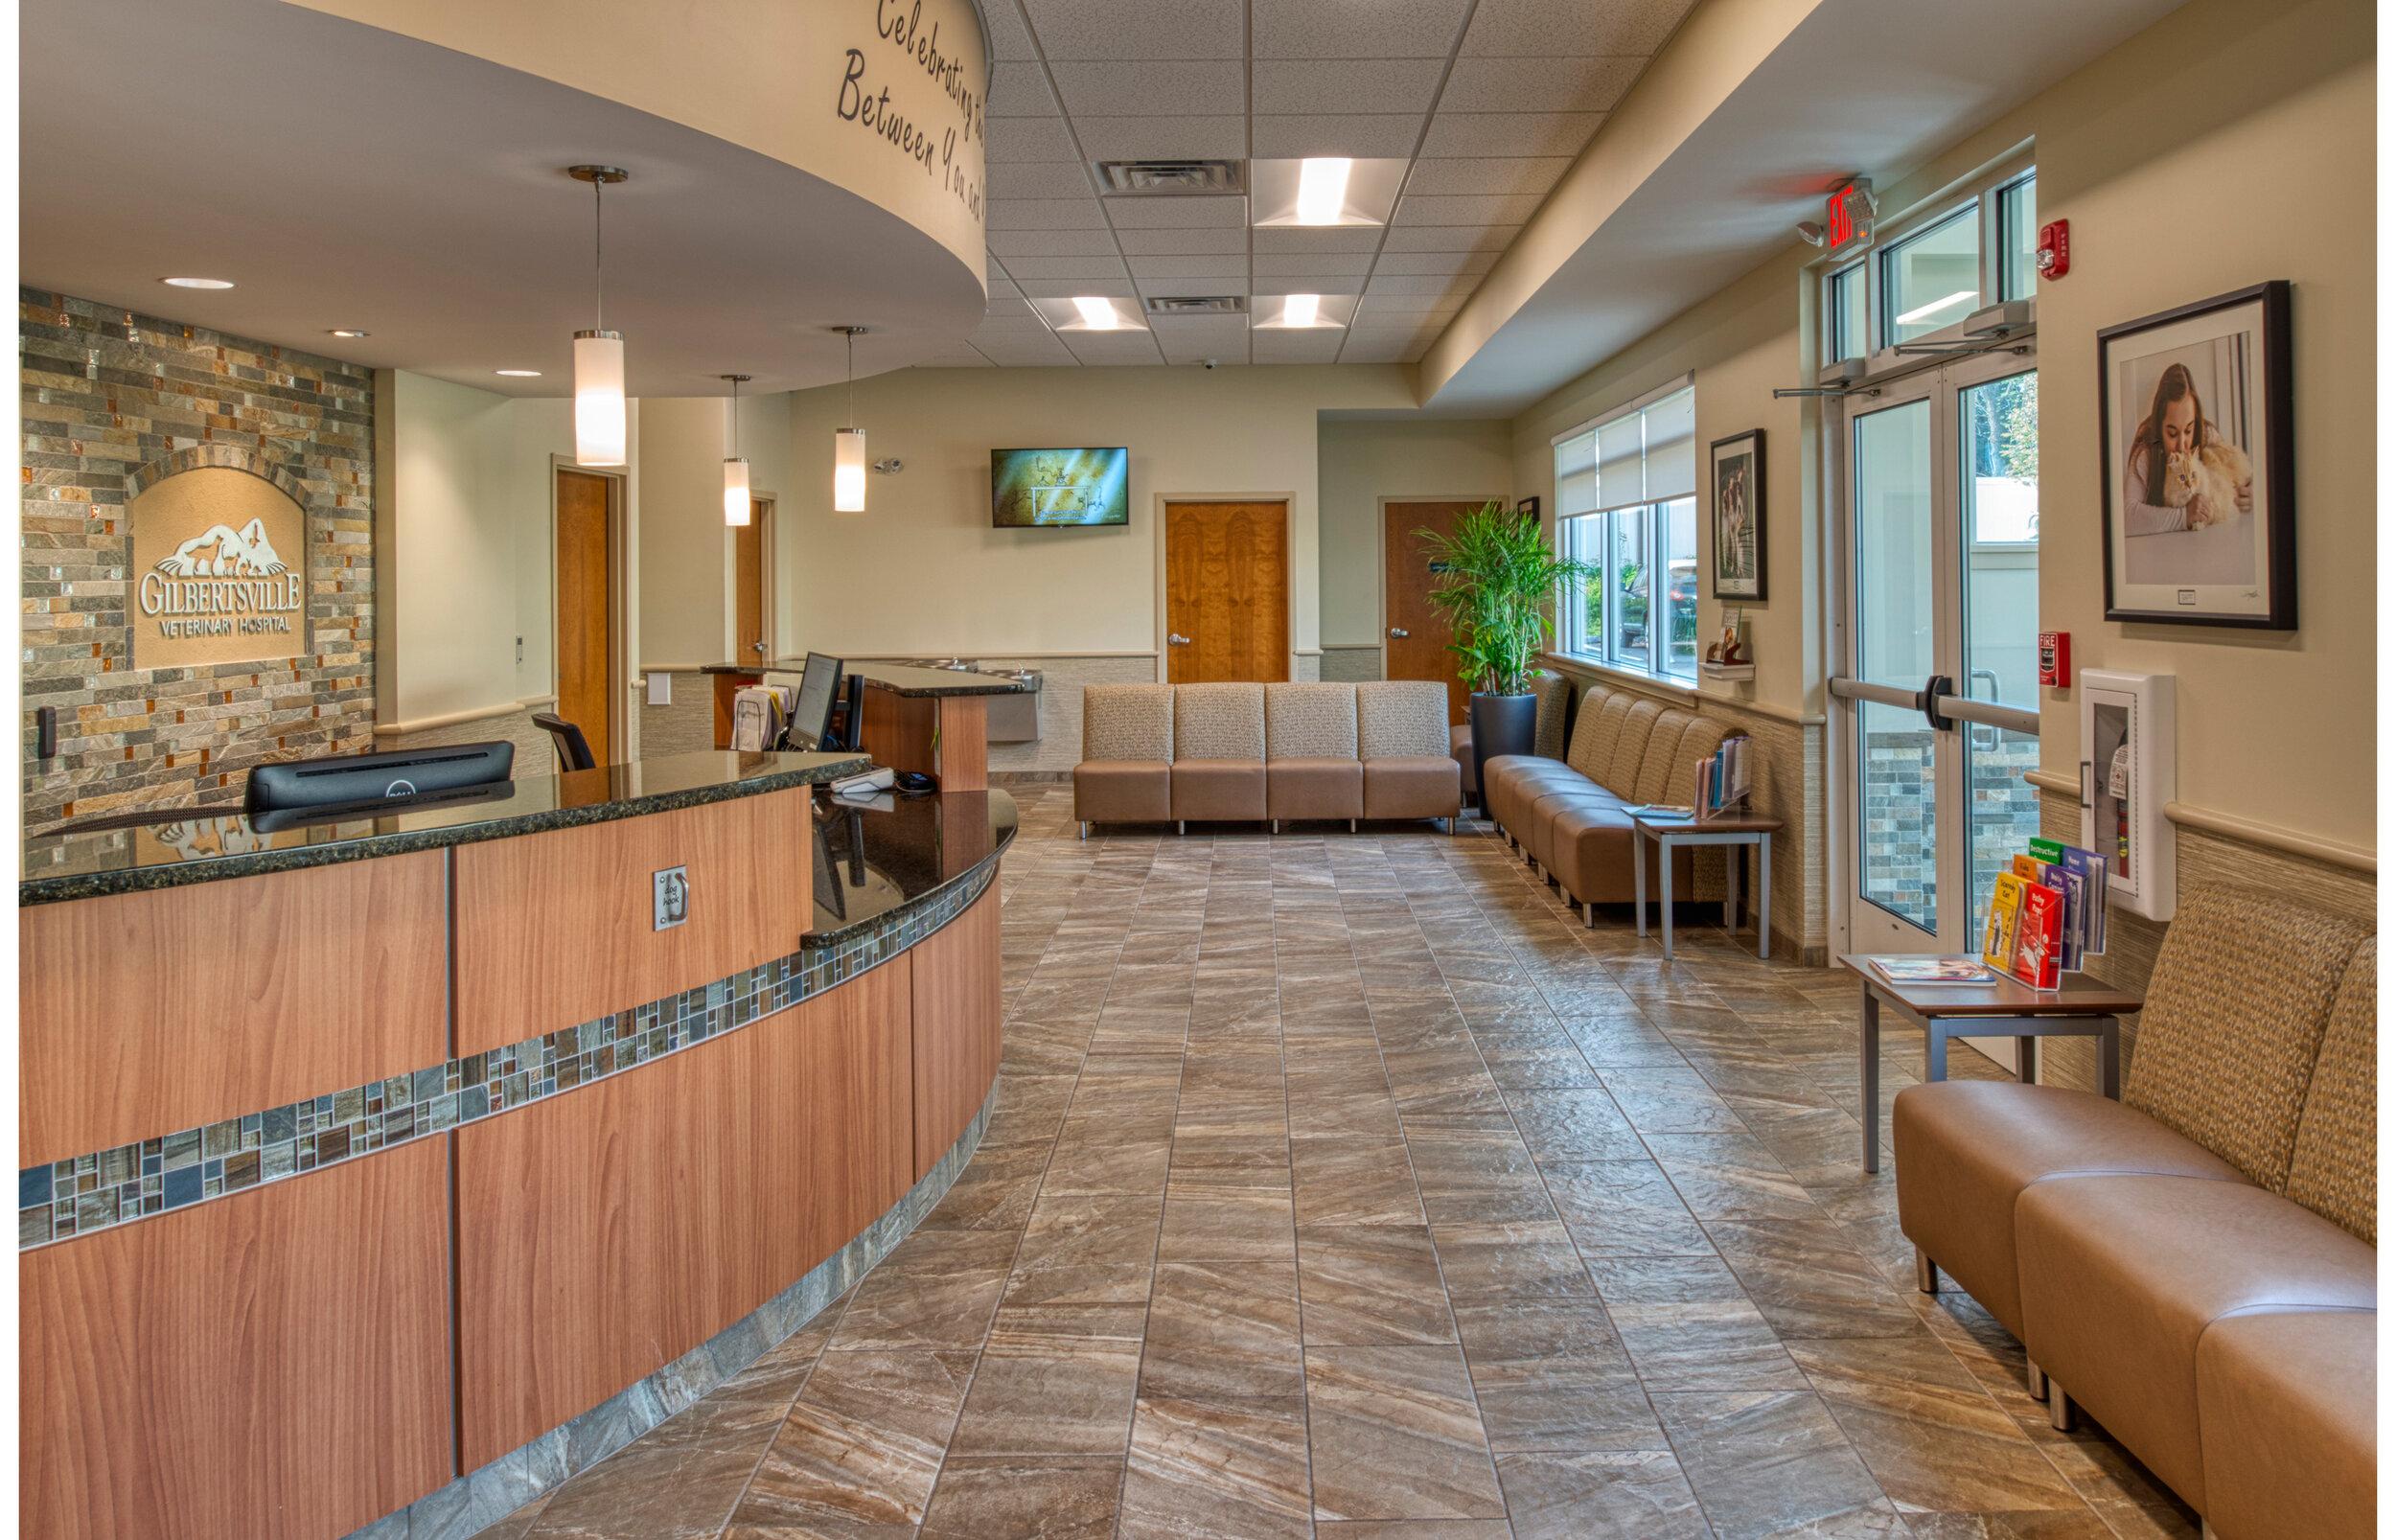 GilbertsvilleVeterinaryHospital_Waiting2.jpg